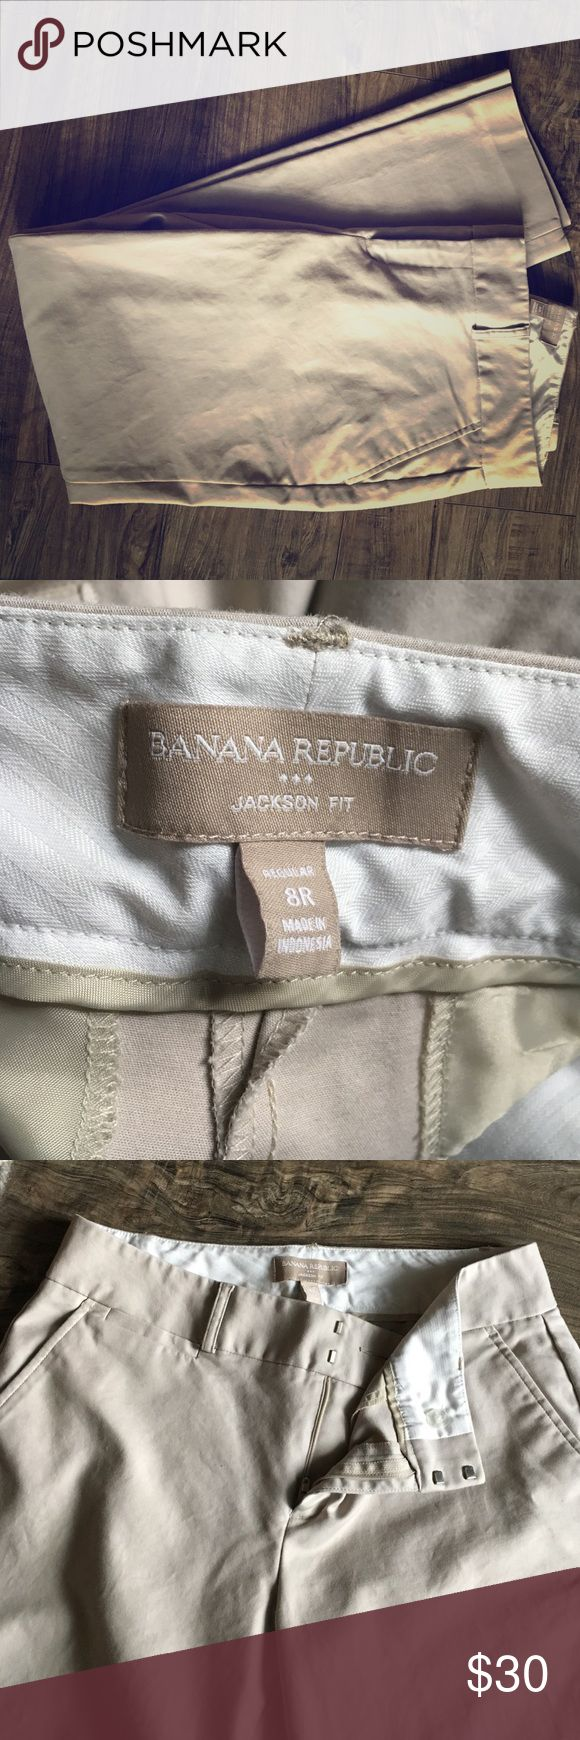 Banana Republic Jackson fit khakis Like new. Slim fit khakis. Size 8R Jackson fit Banana Republic Pants Skinny